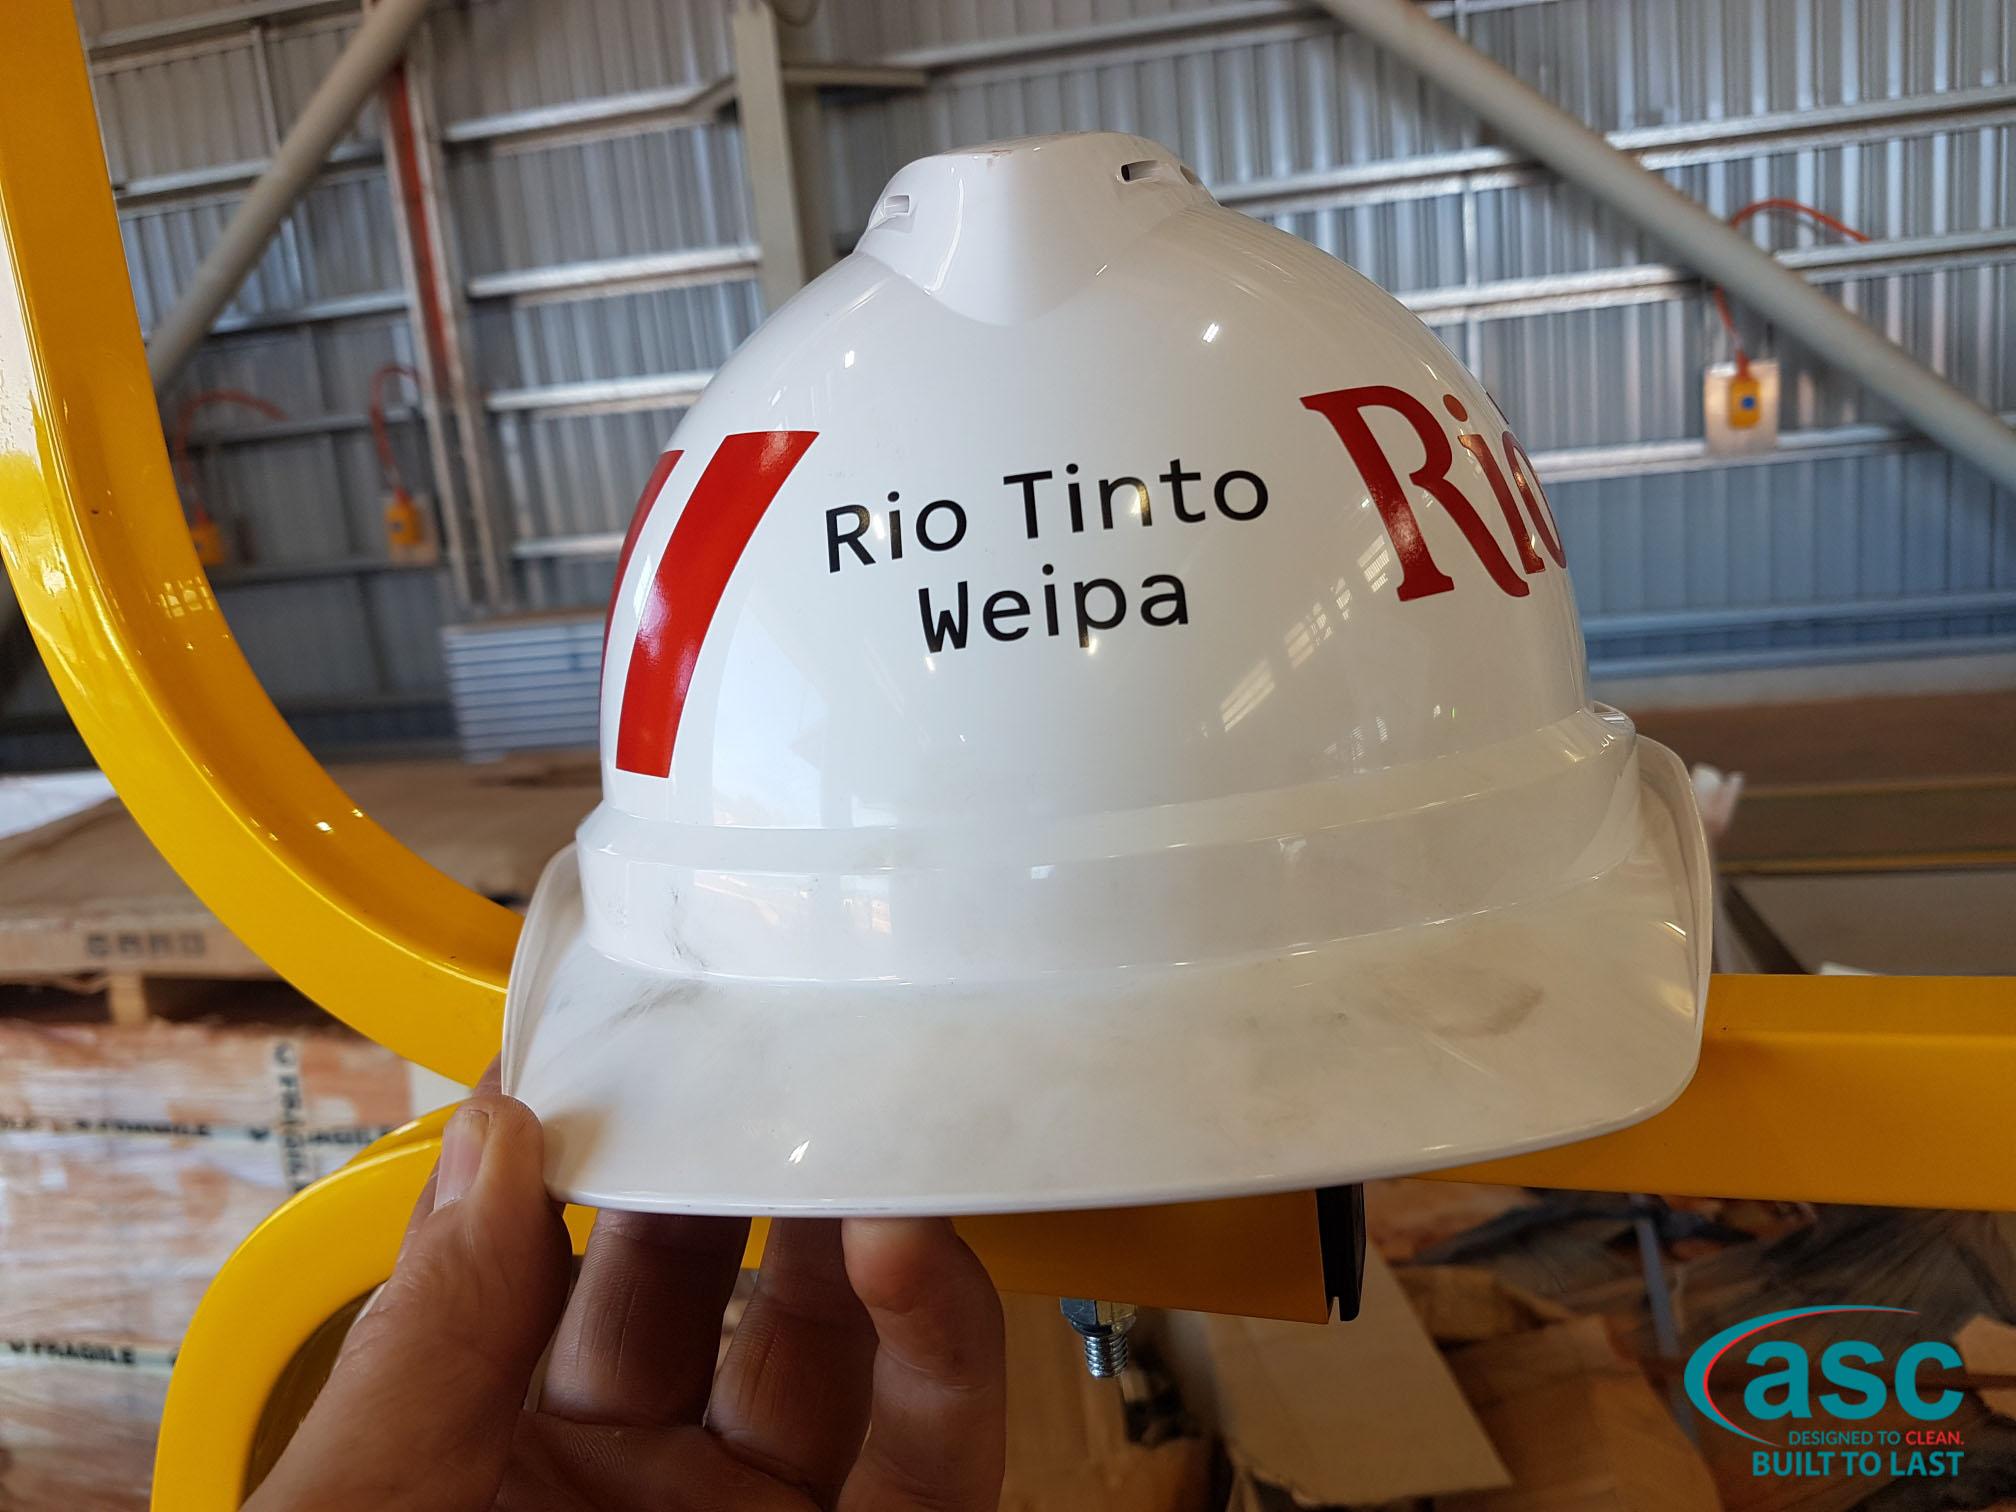 Rio Tinto Weipa Helmet